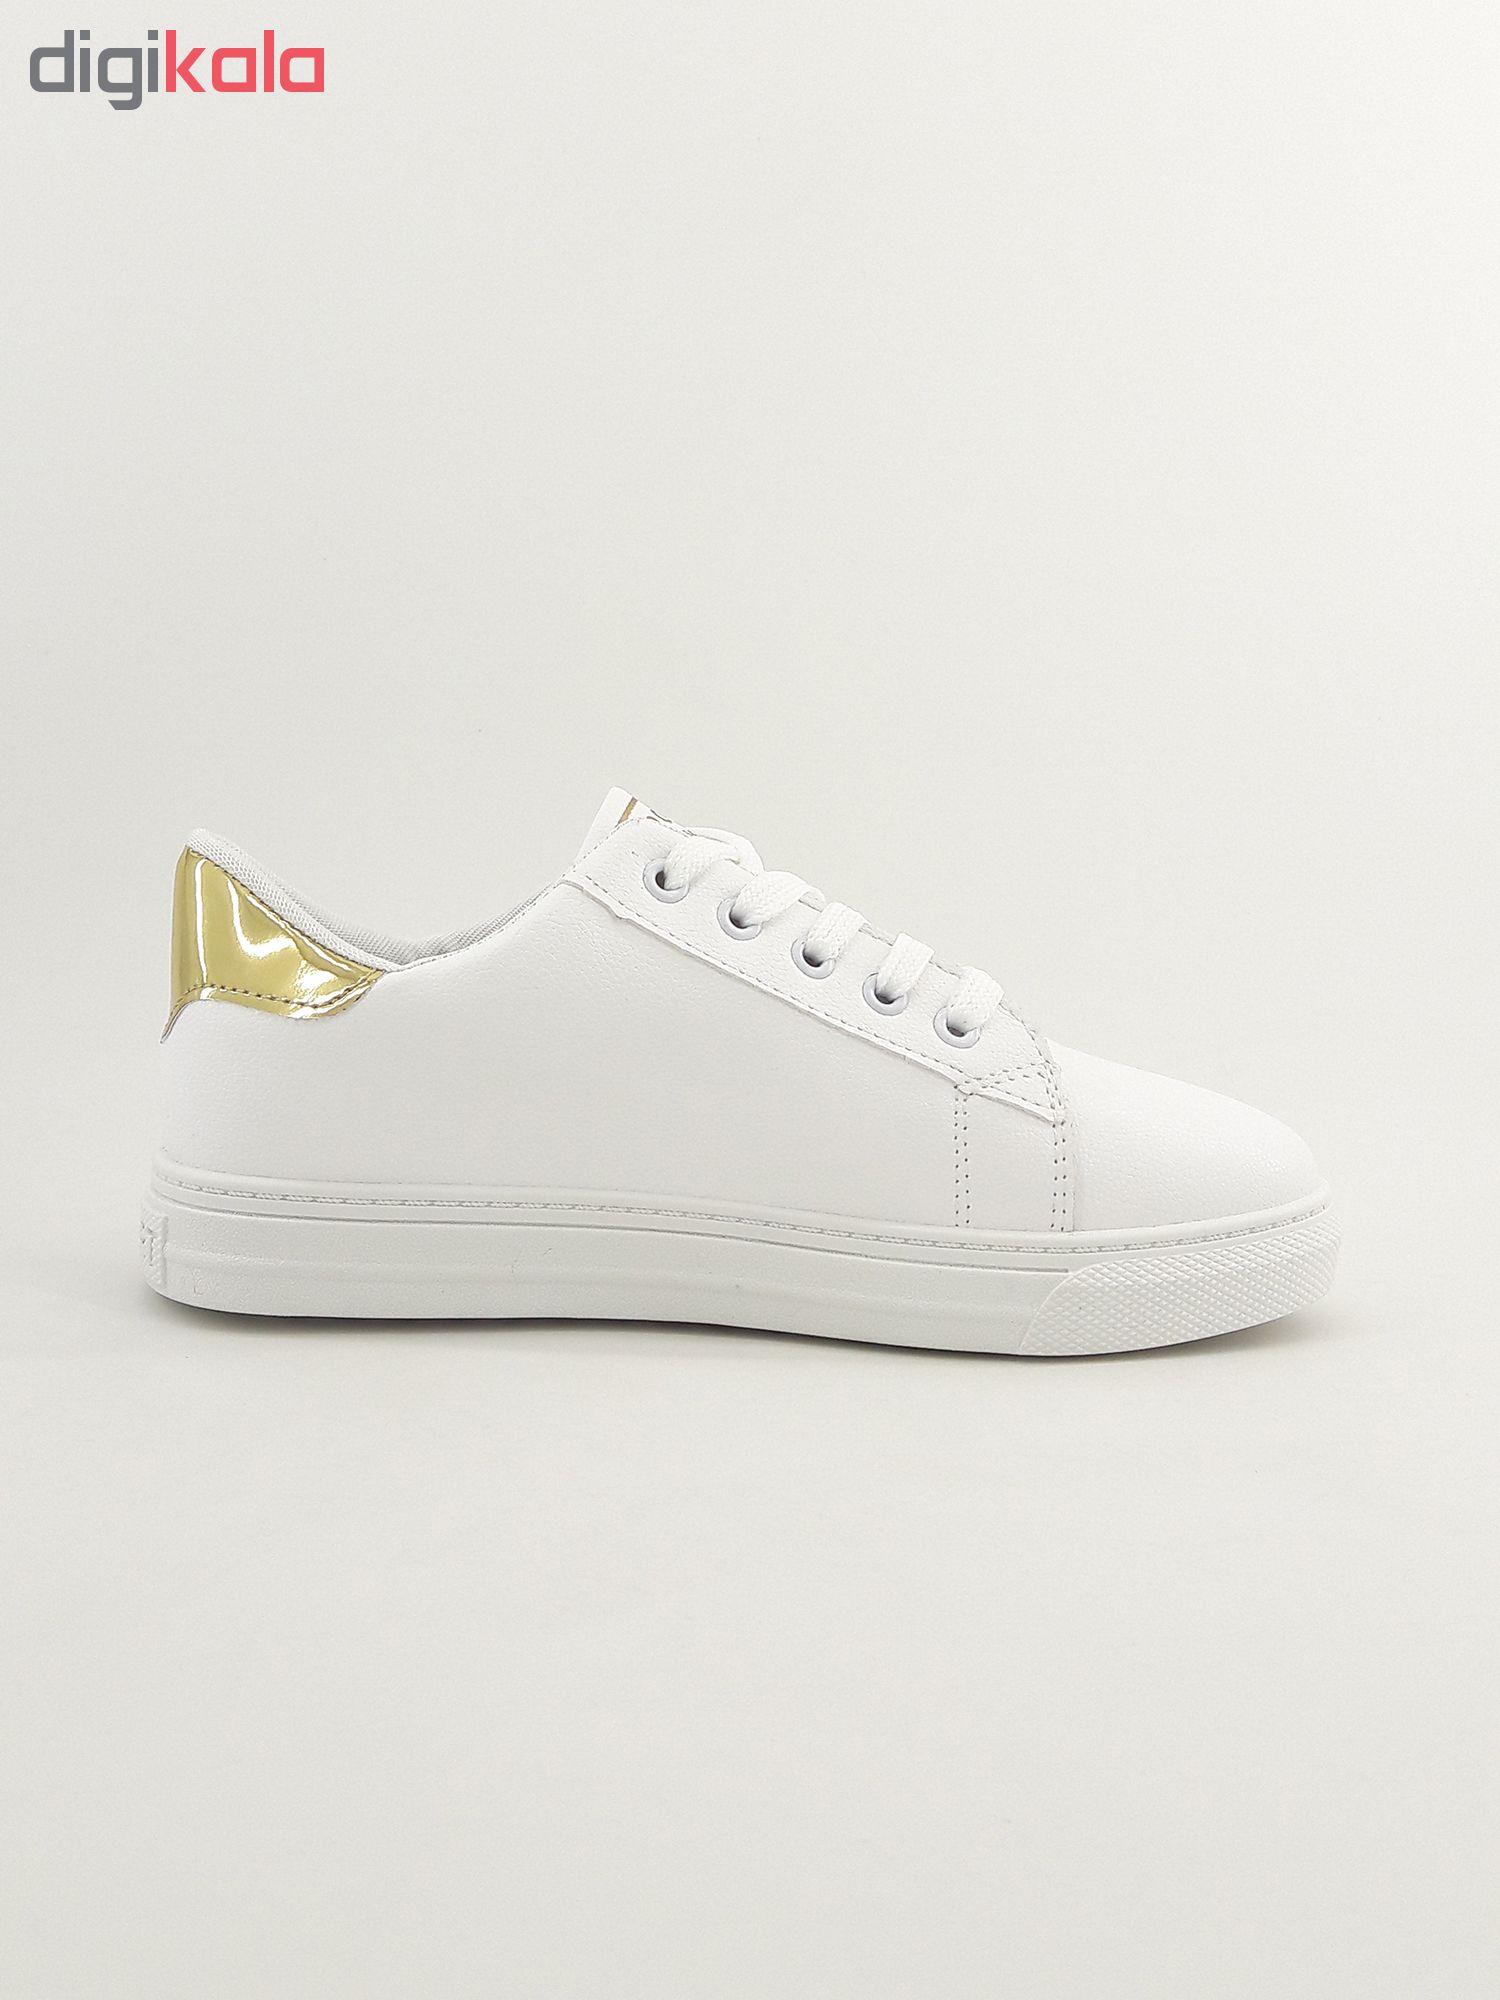 کفش راحتی زنانه اسپرت مدل 3stars.wh-gld-001